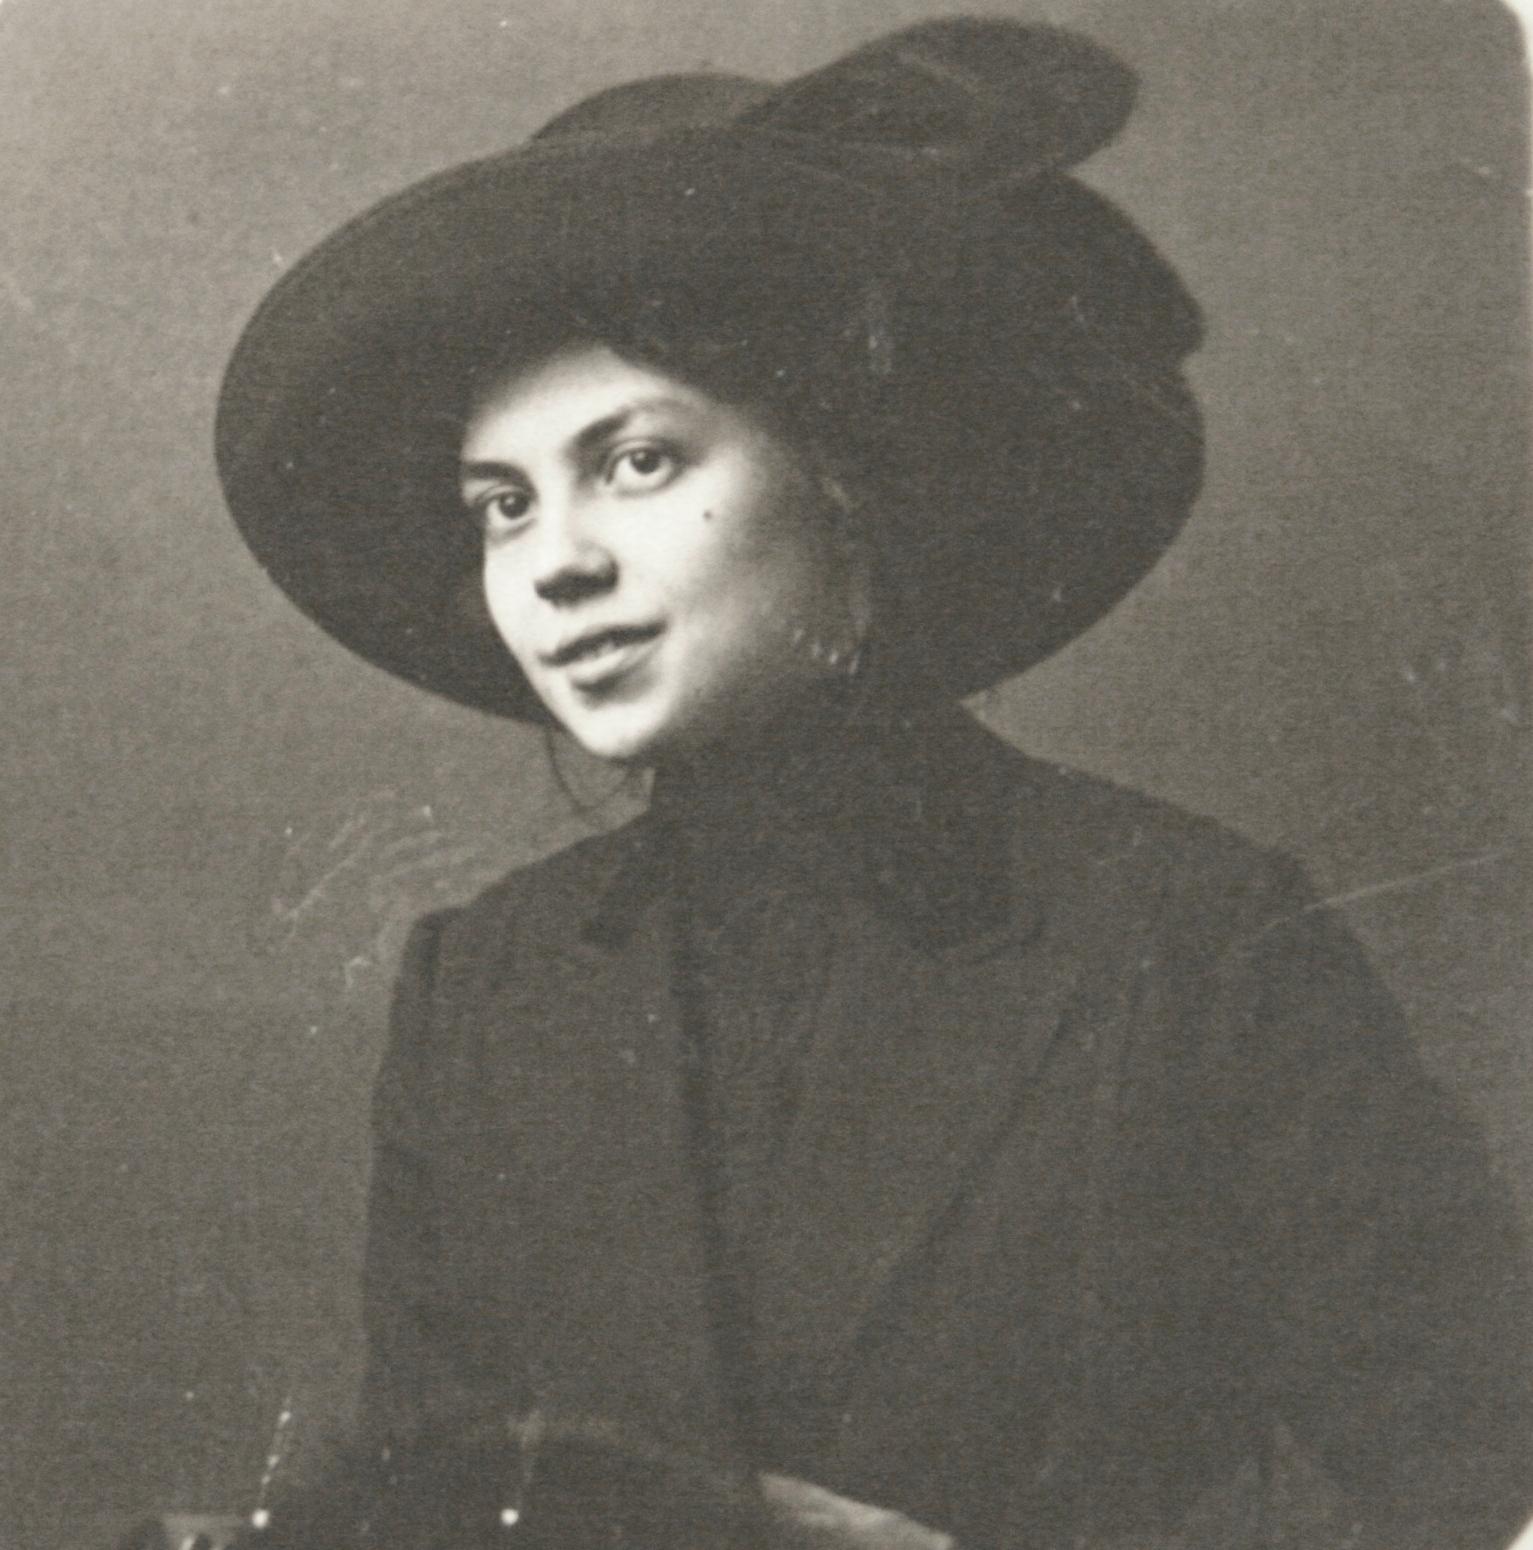 István Bibó's mother: Irén Graul, 1910s